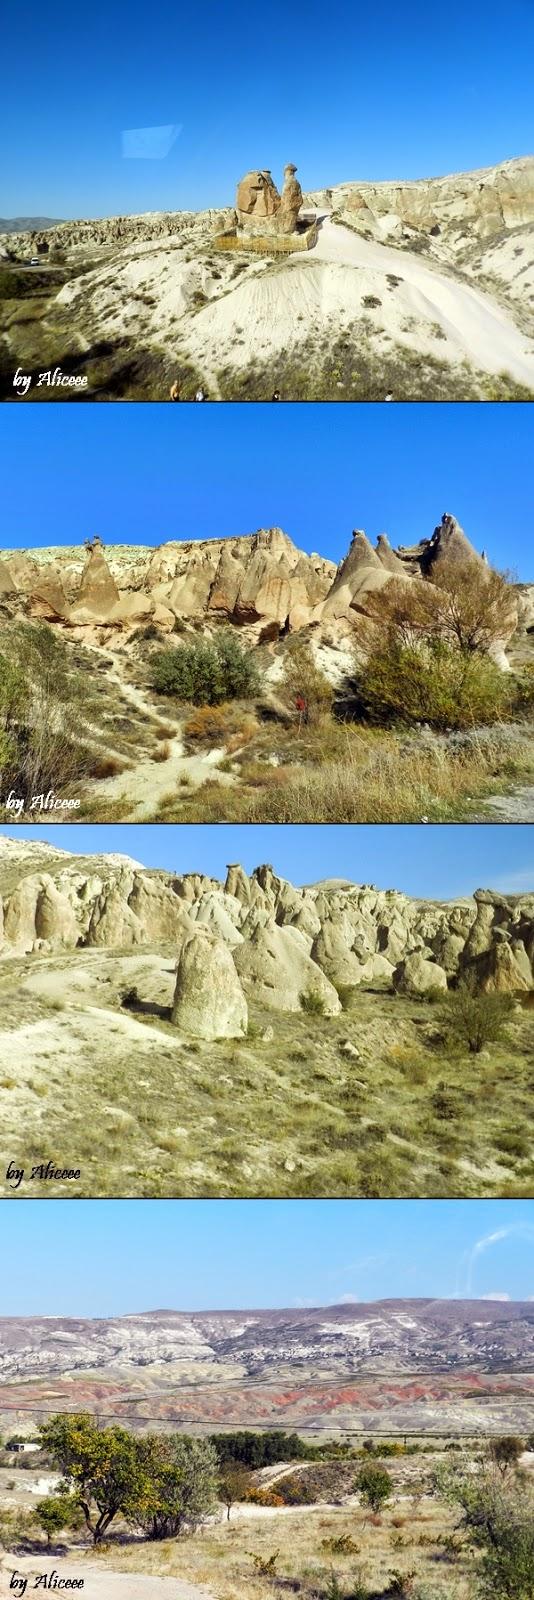 cappadocia-turcia-dervent-formatiuni-camila